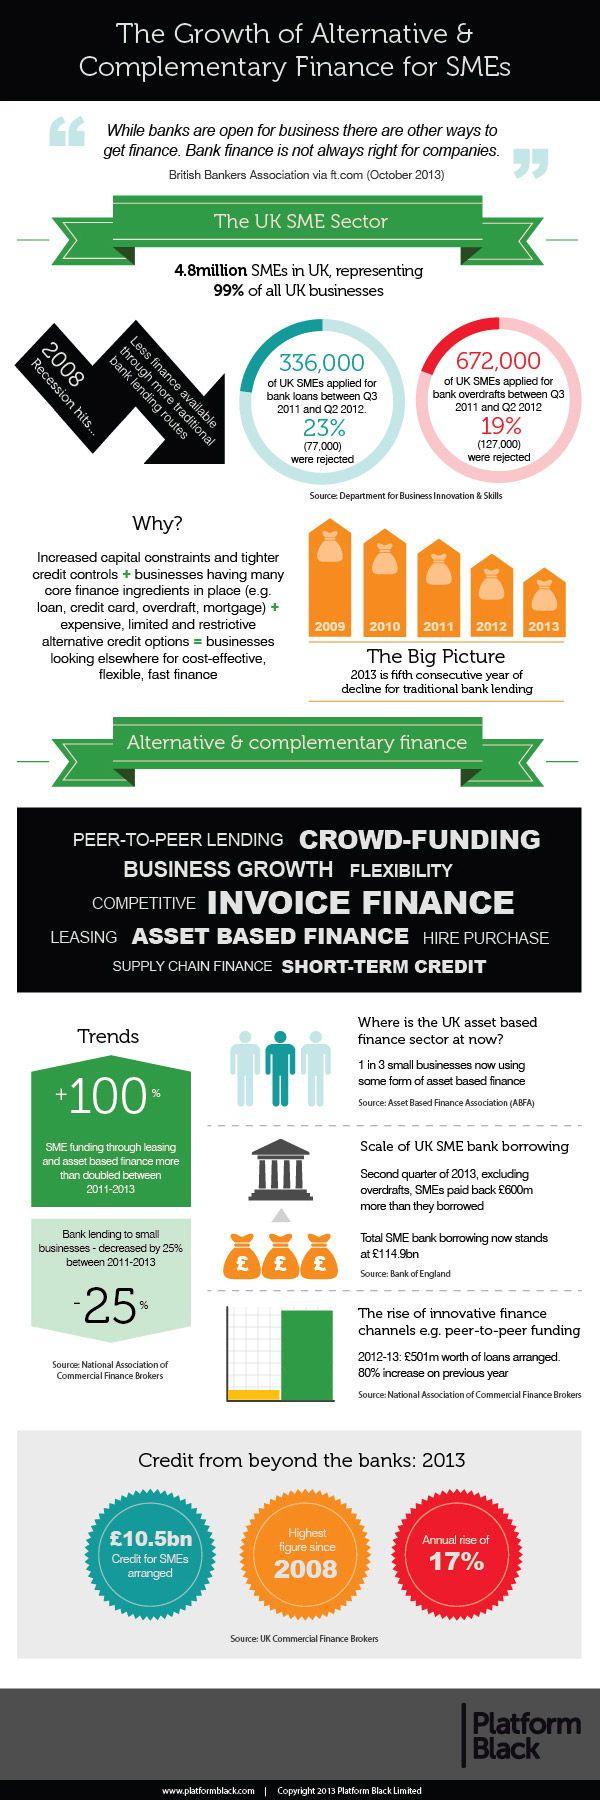 United Kingdom Alternative Finance For Sme S Infographic Crowdfund Insider Finance Infographic Finance Infographic